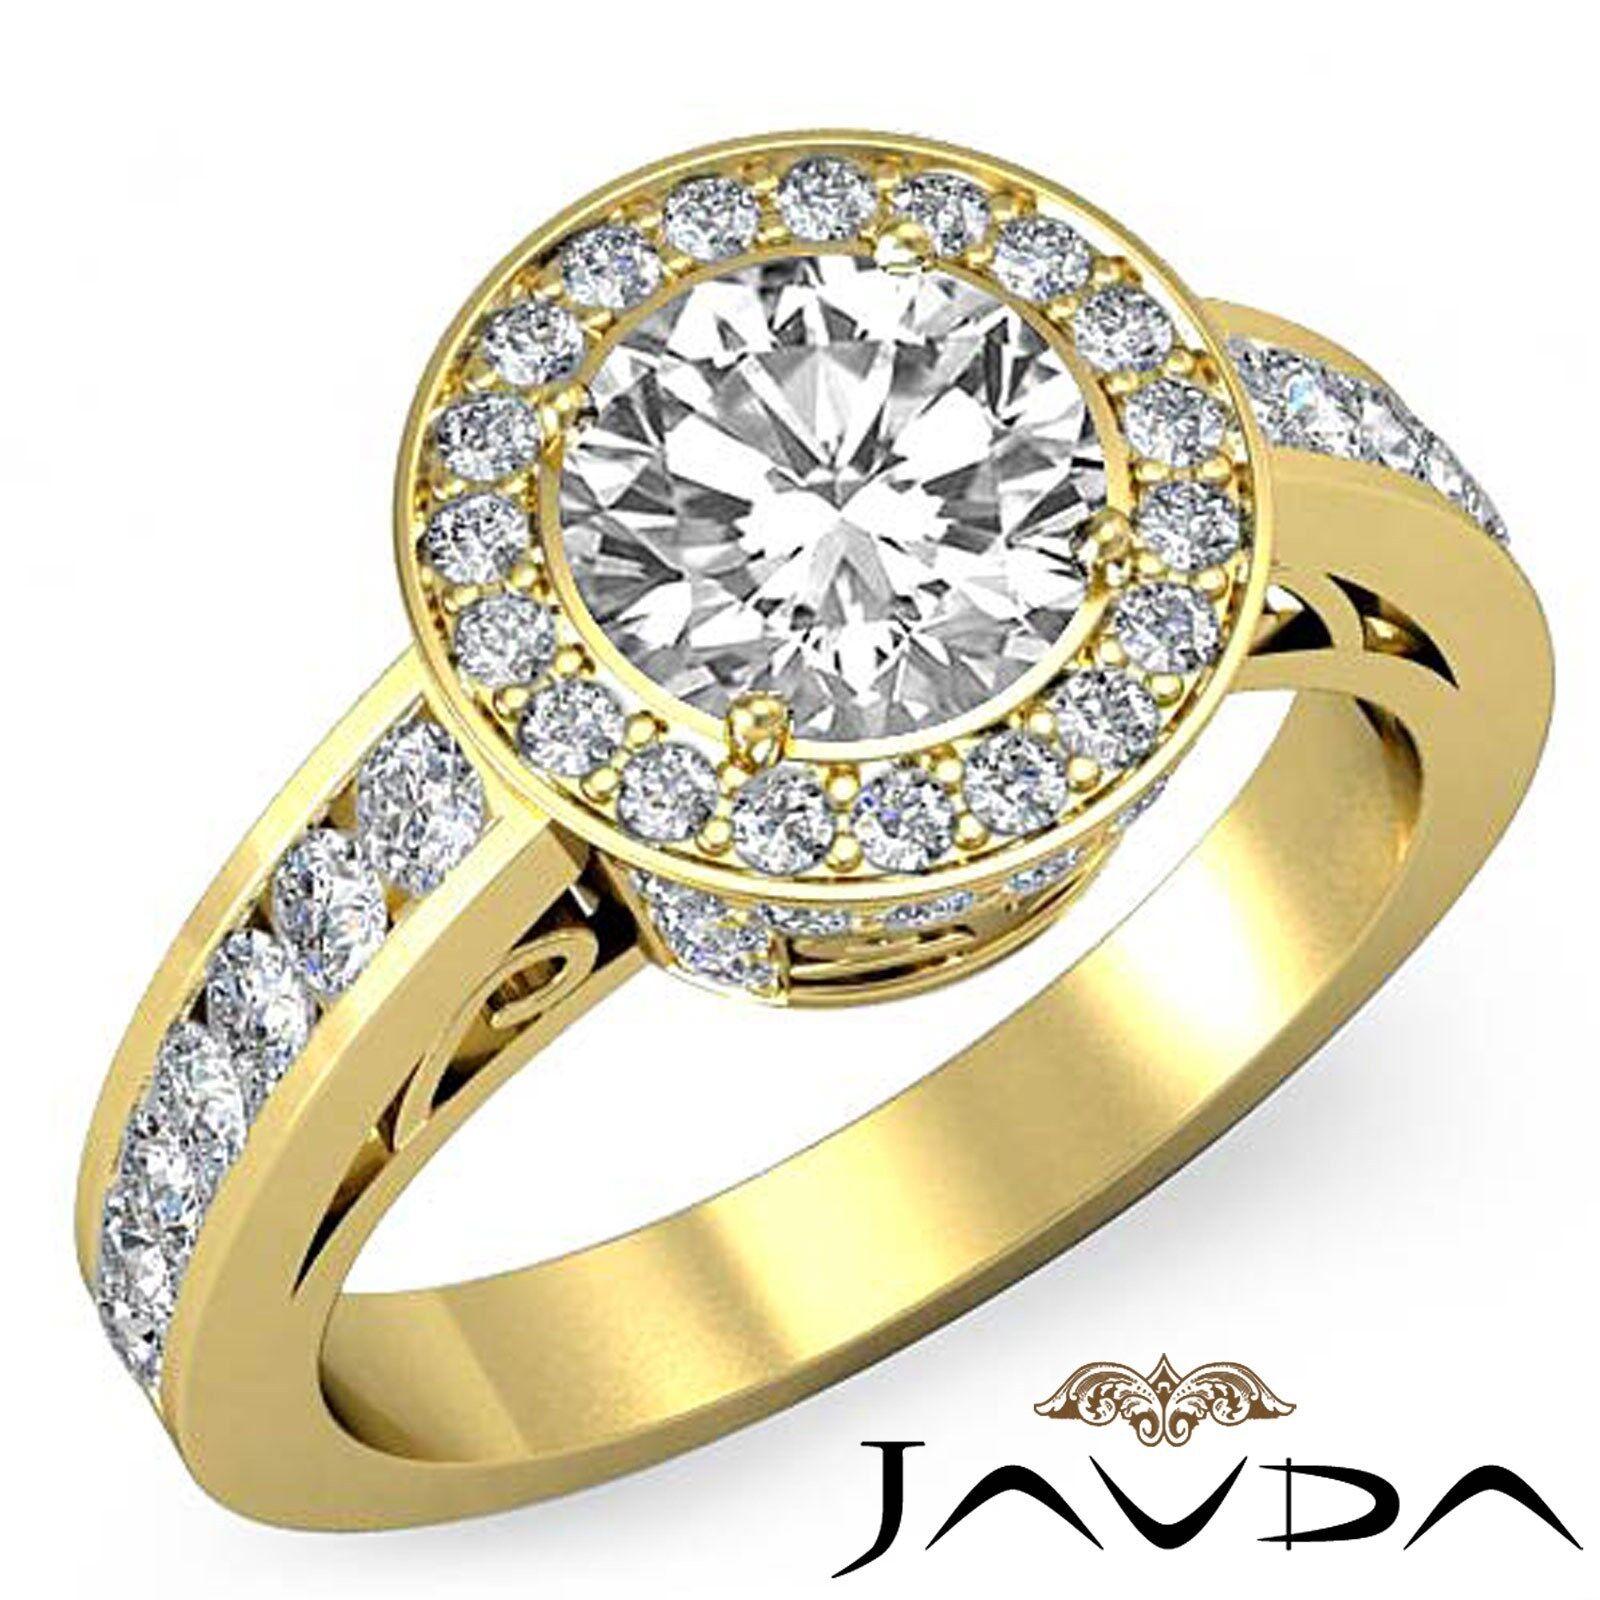 Circa Halo Micro Pave Round Diamond Engagement Anniversary Ring GIA F VS2 2.3Ct